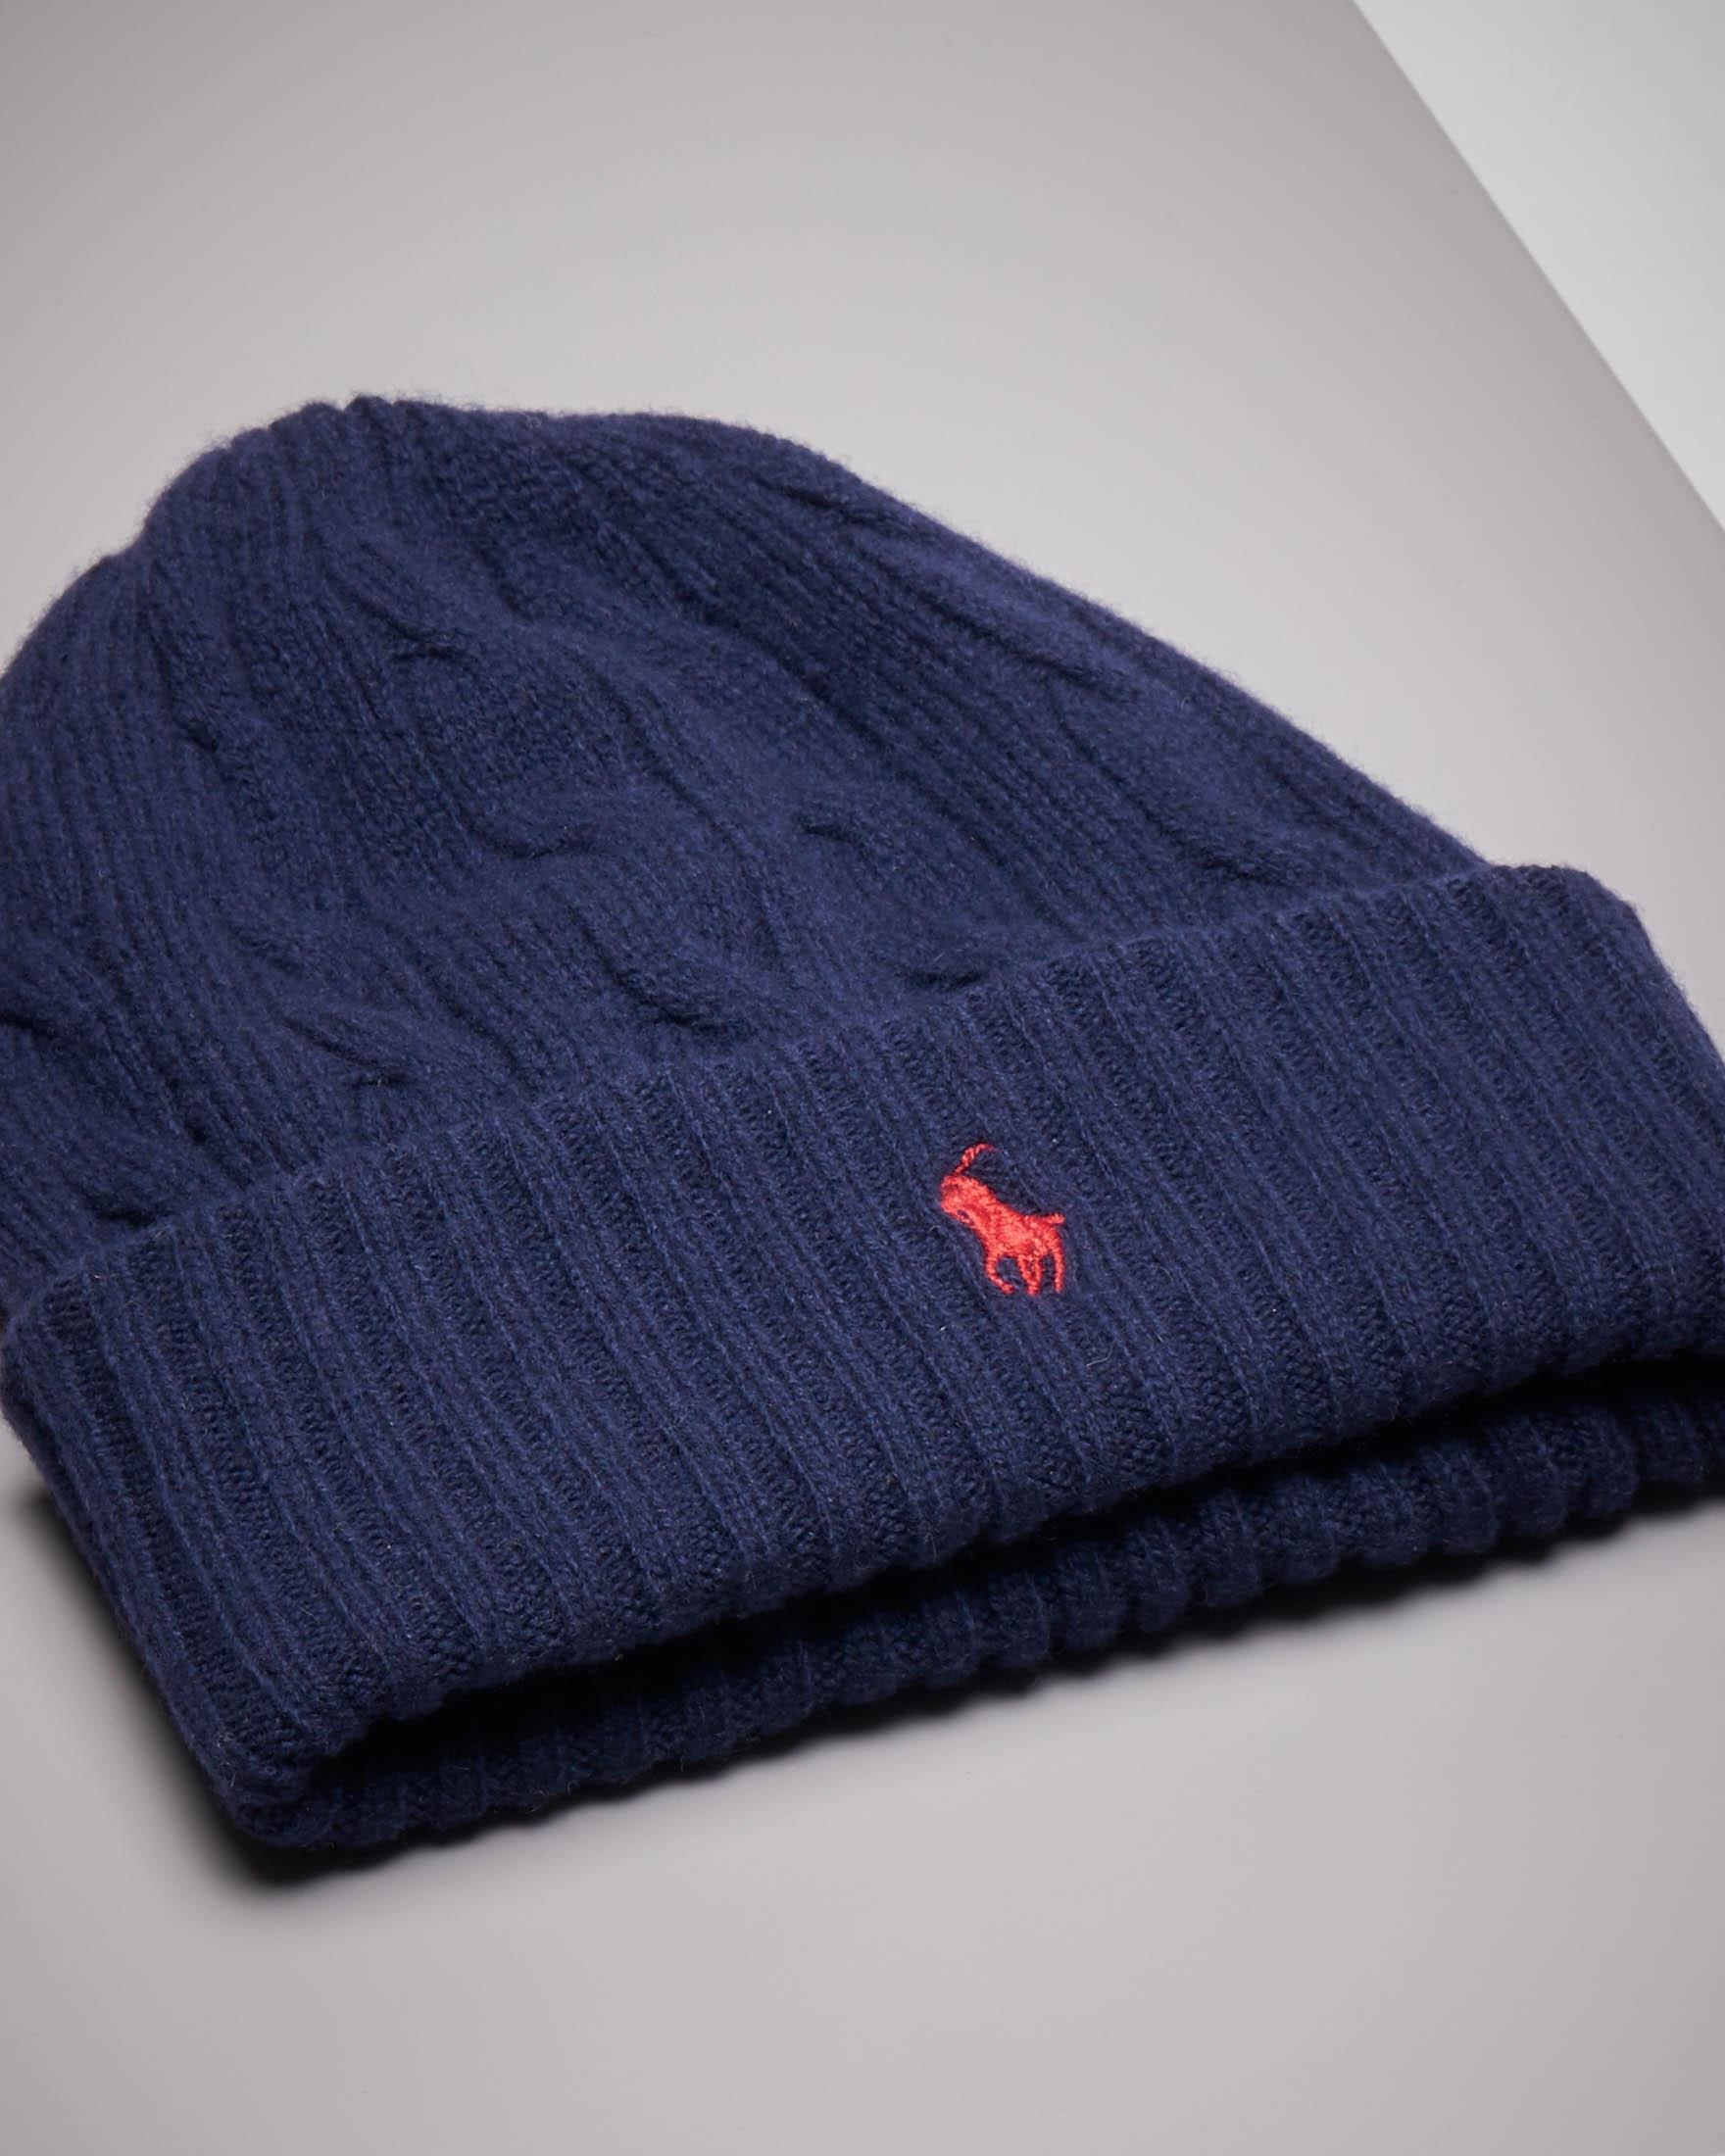 ... lana misto cashmere · Polo Ralph Lauren 32f6fca5a64e